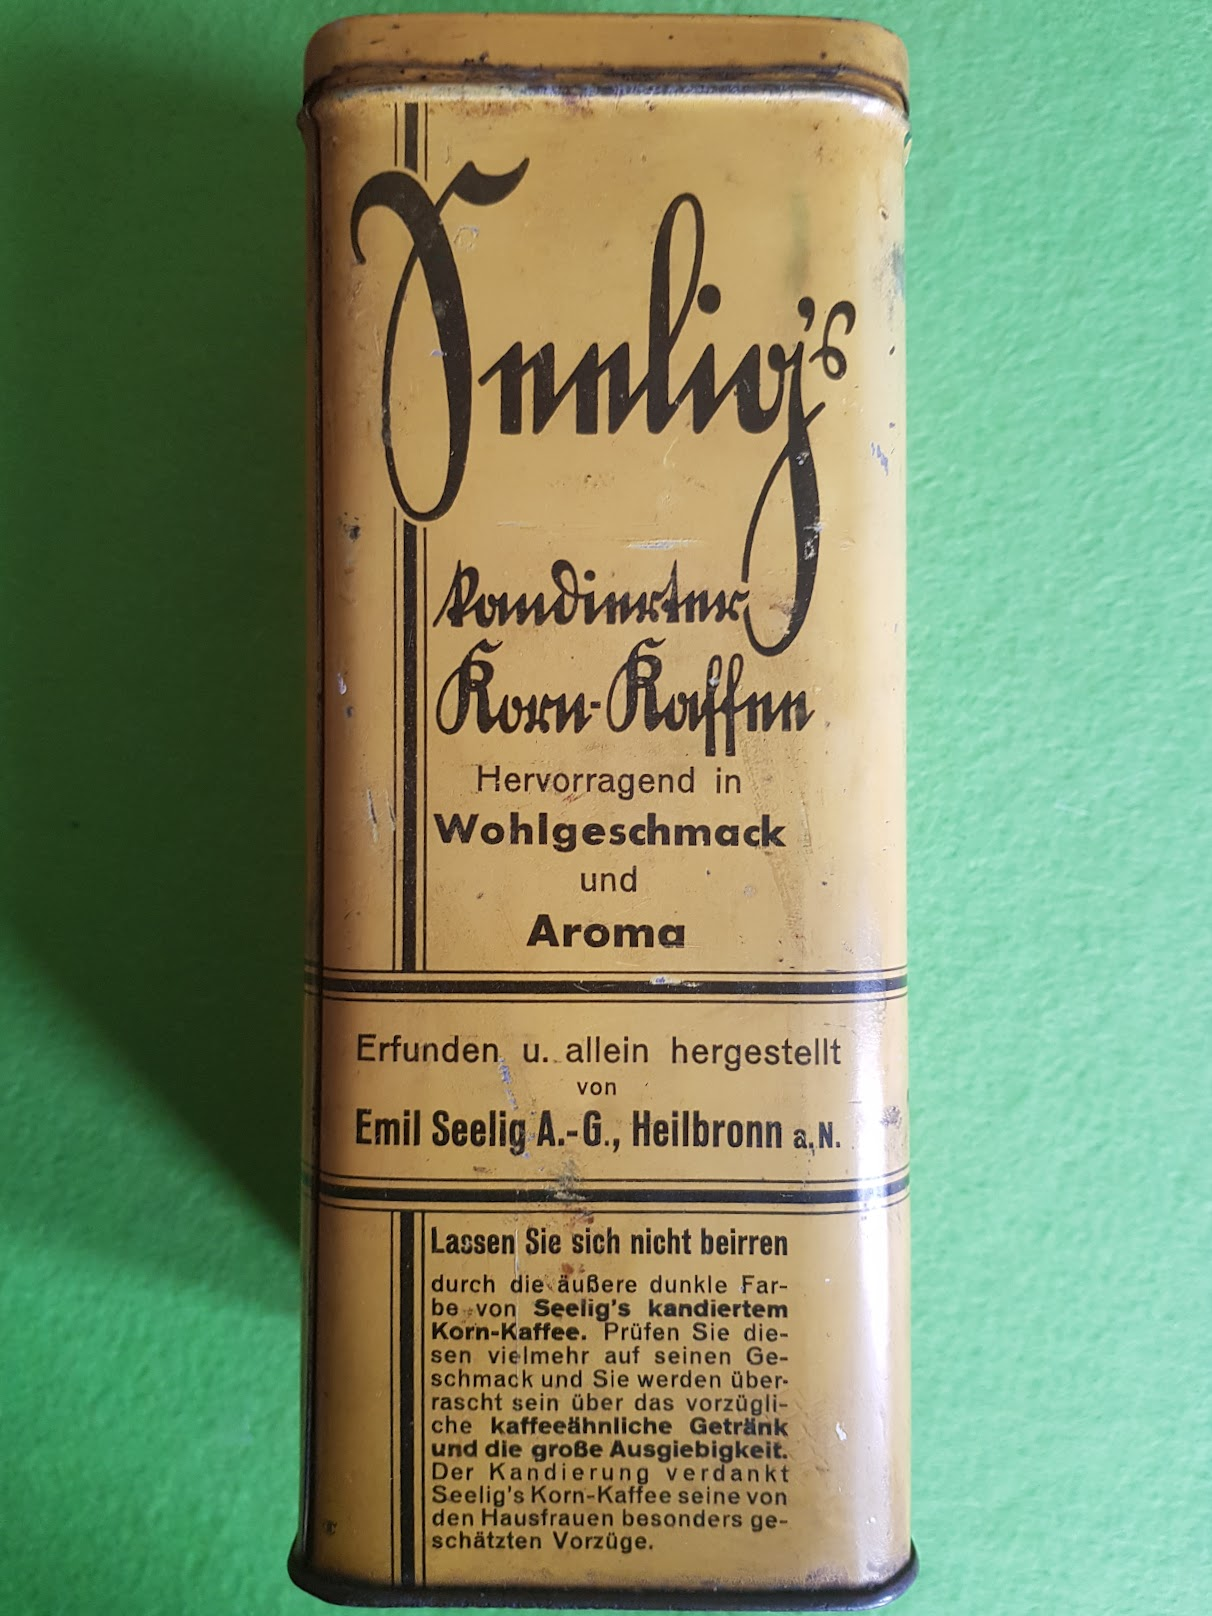 Seelig's kandierter Korn-Kaffee, Kaffee-Ersatz, Firma Emil Seelig, Heilbronn